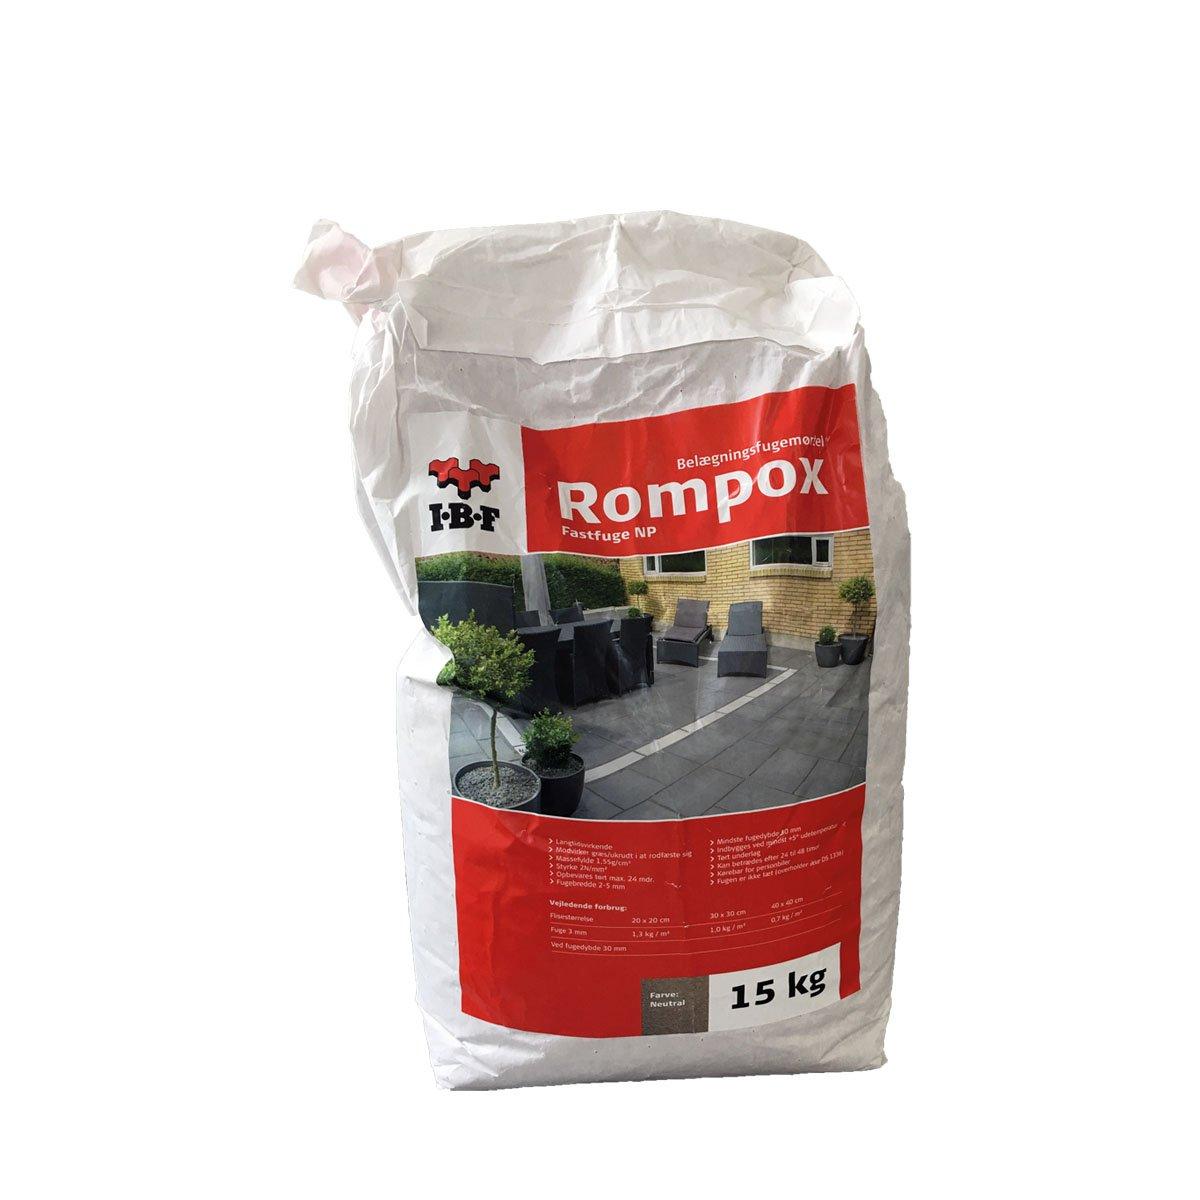 Rompox®-Fastfuge NP